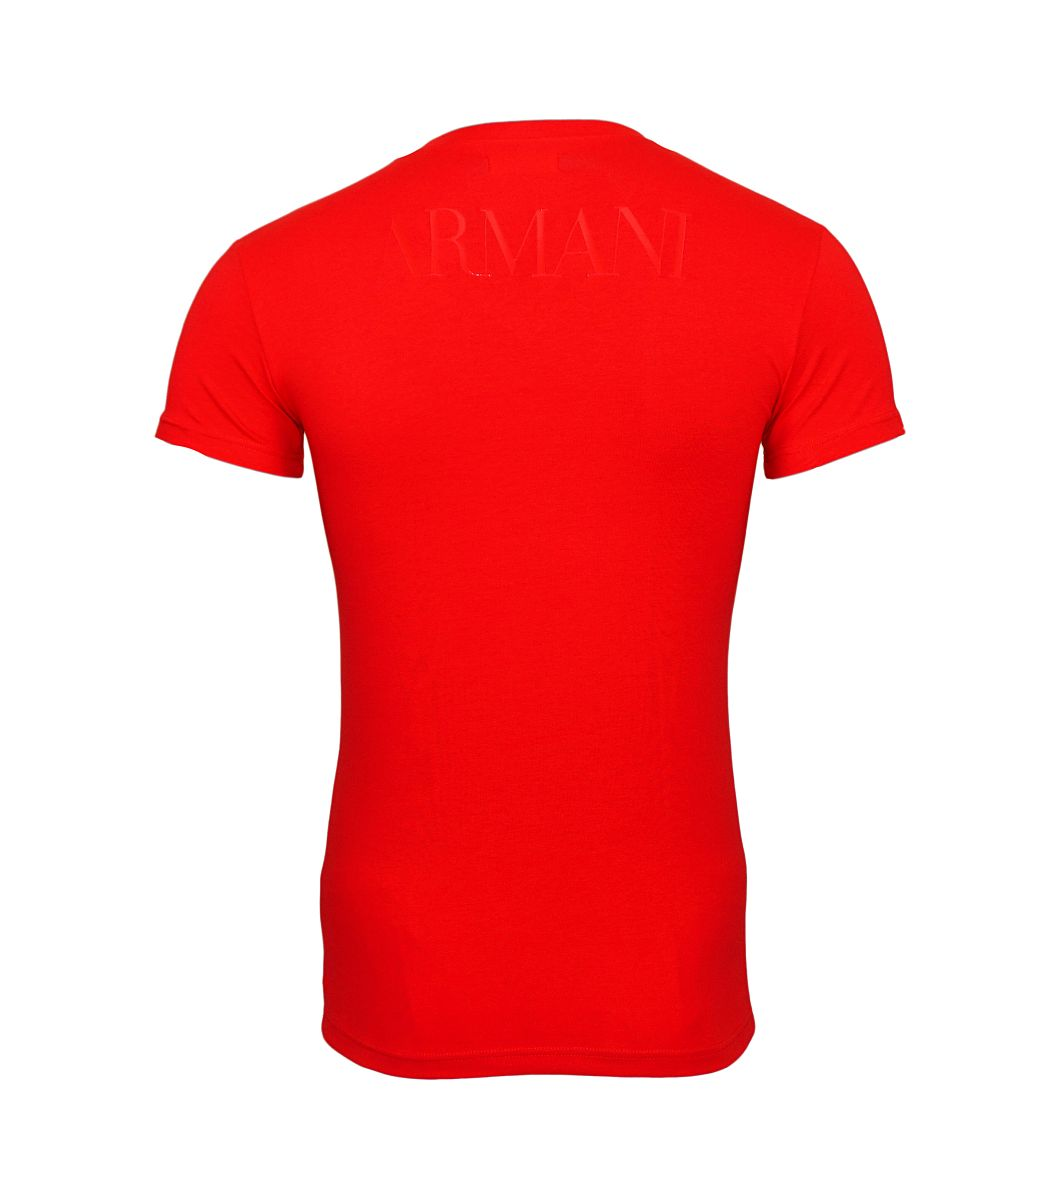 Emporio Armani T-Shirts V-Ausschnitt 110810 8P516 17574 TANGO RED W18-EATS1